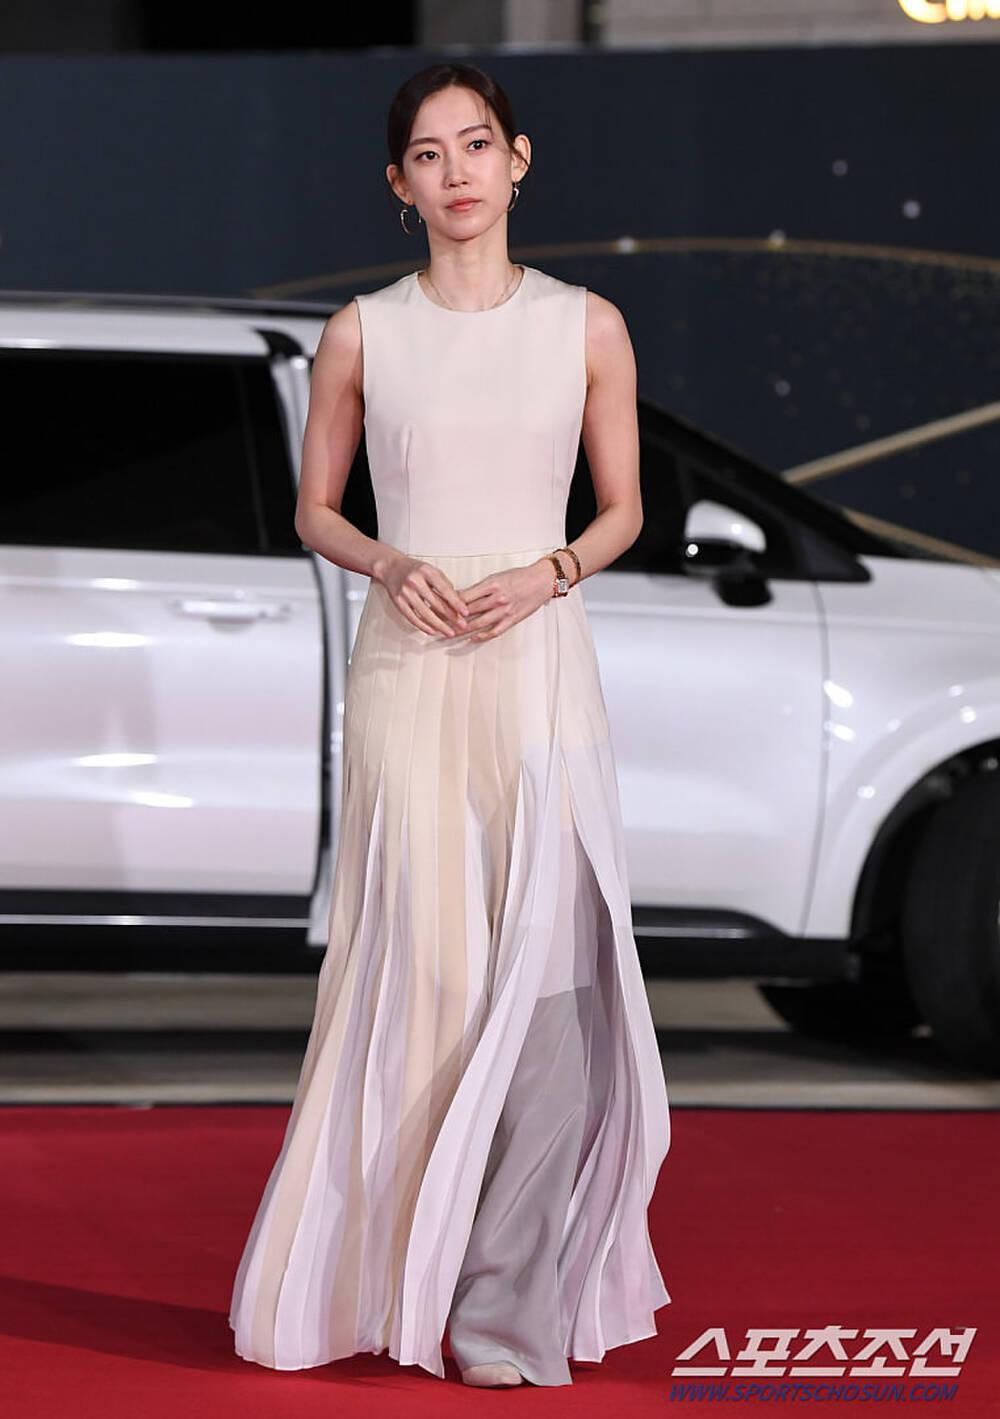 Thảm đỏ 'Rồng xanh 2020': Shin Hye Sun 'cân sắc' Shin Min Ah, Jung Woo Sung - Lee Byung Hun điển trai! Ảnh 49